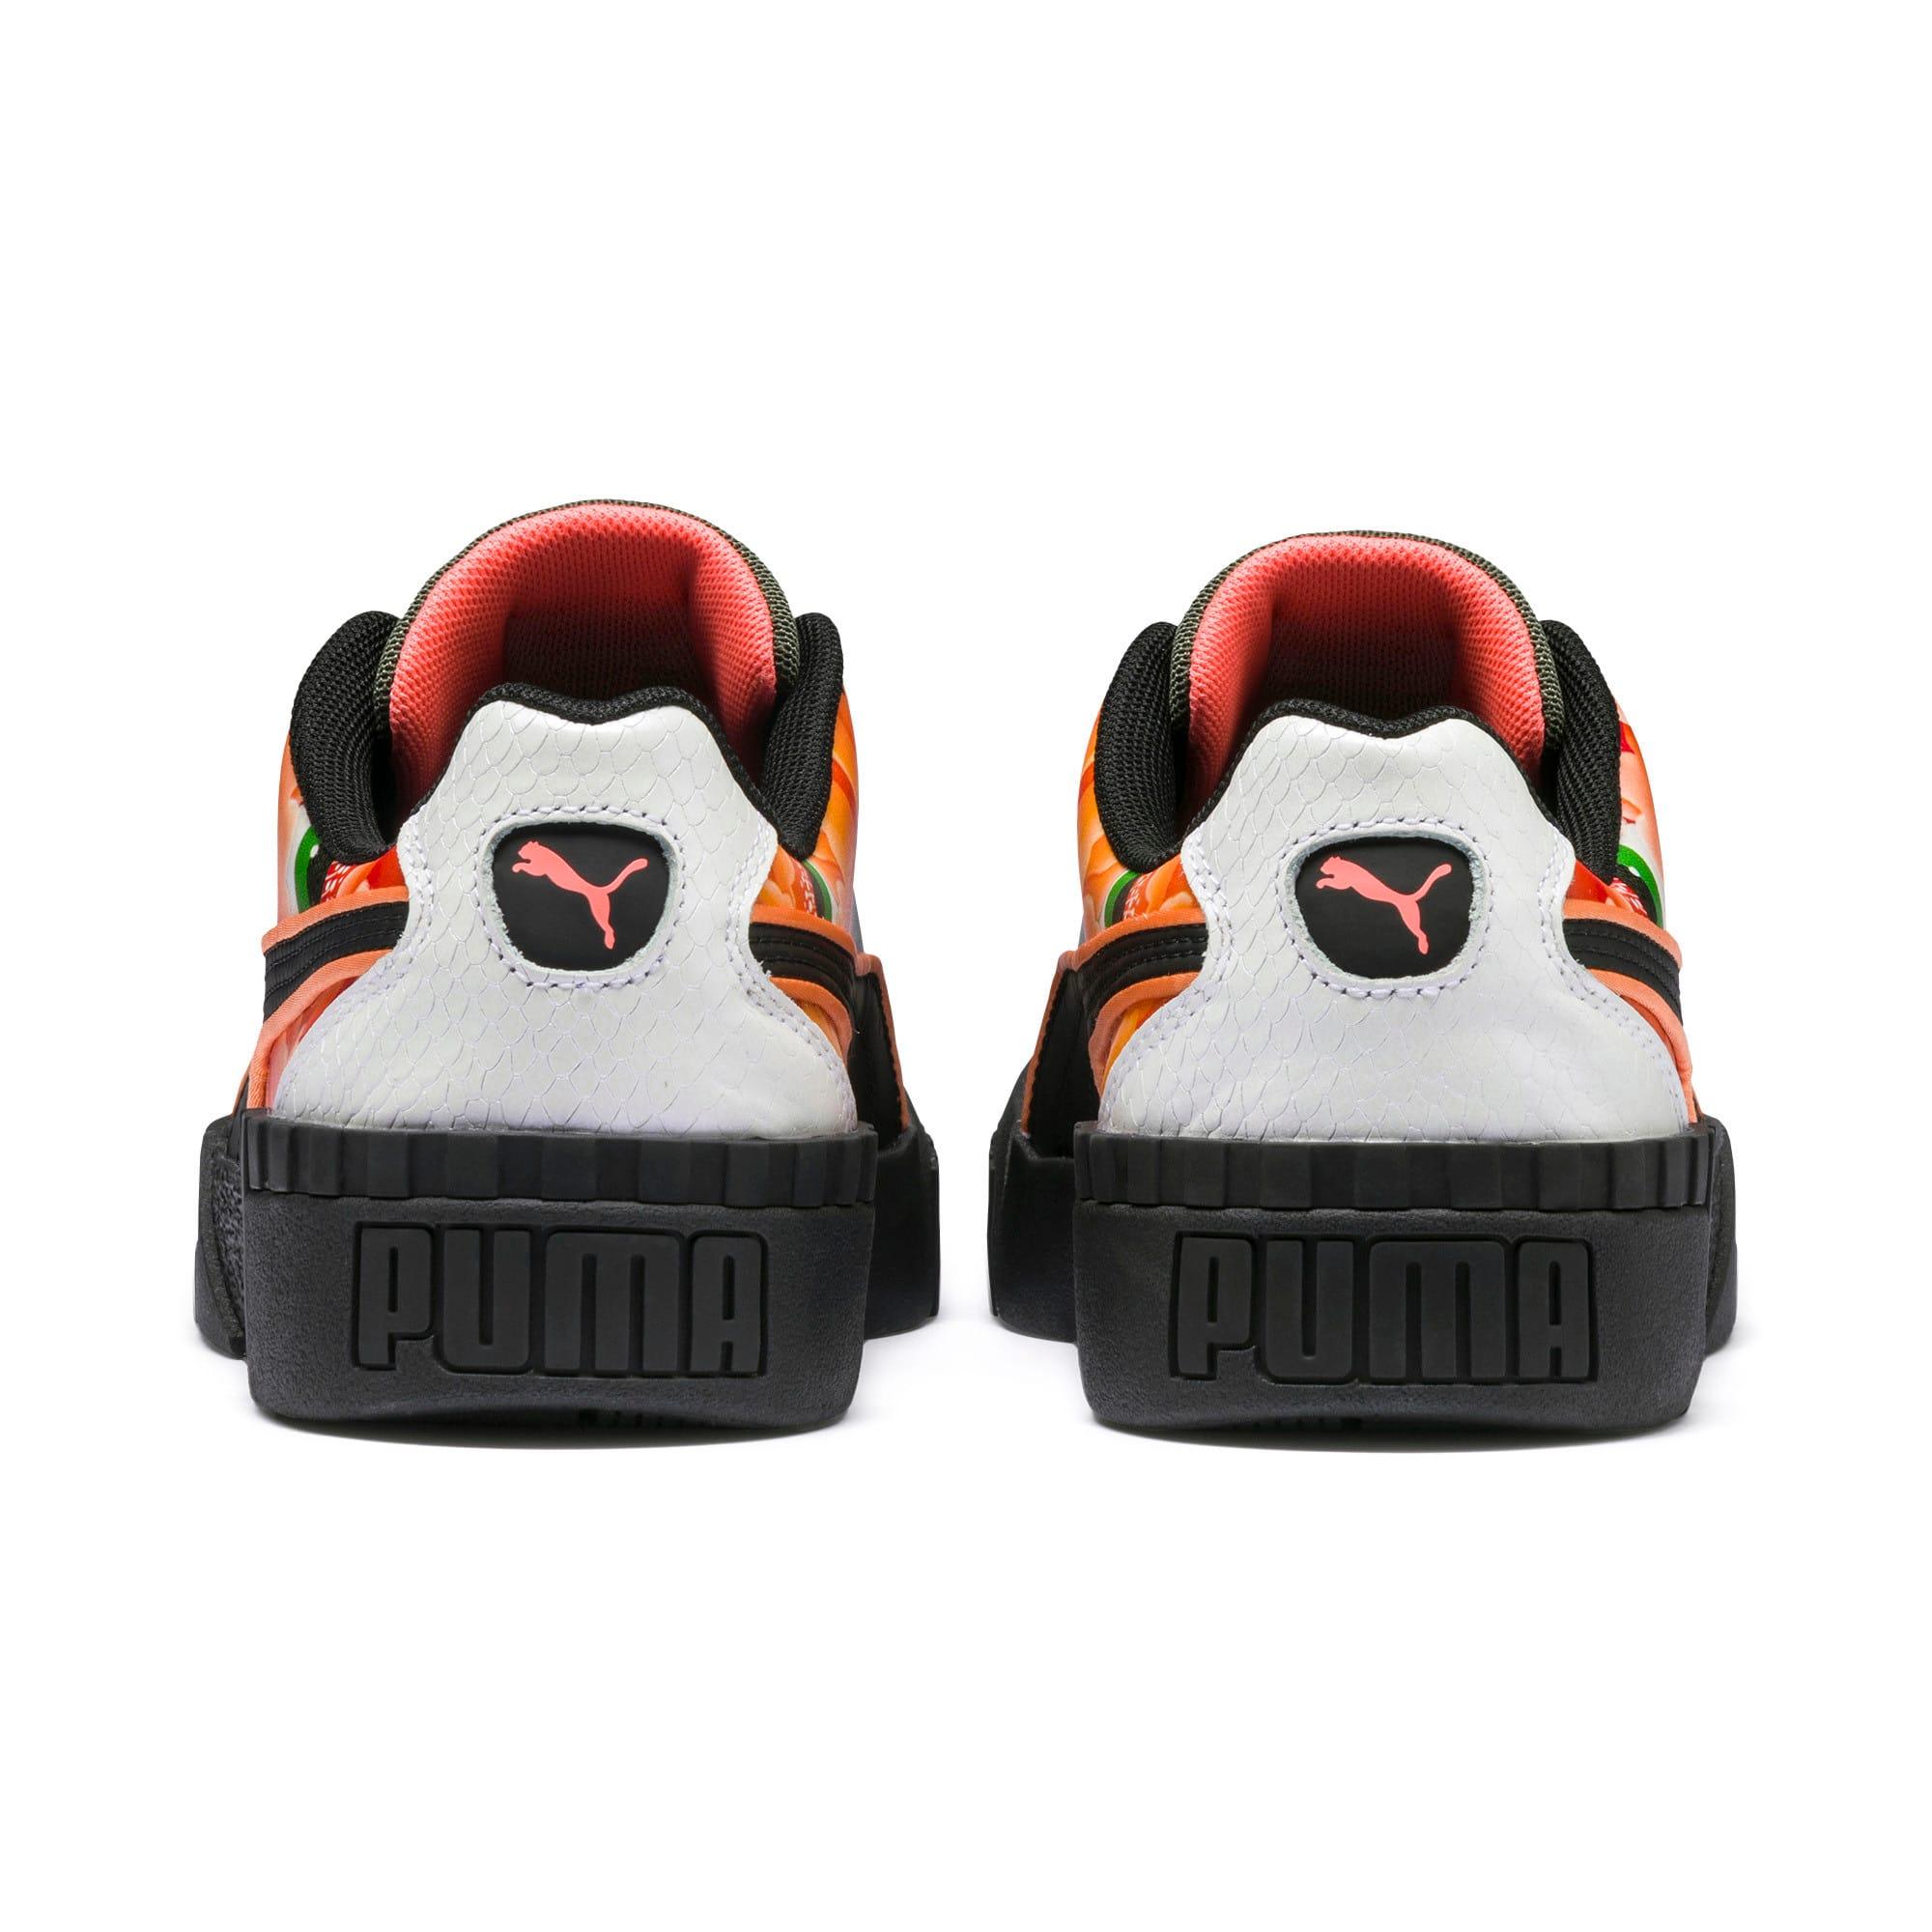 Thumbnail 4 of PUMA x SUE TSAI Cali Peonies Camo Women's Sneakers, Puma Black-Puma Black, medium